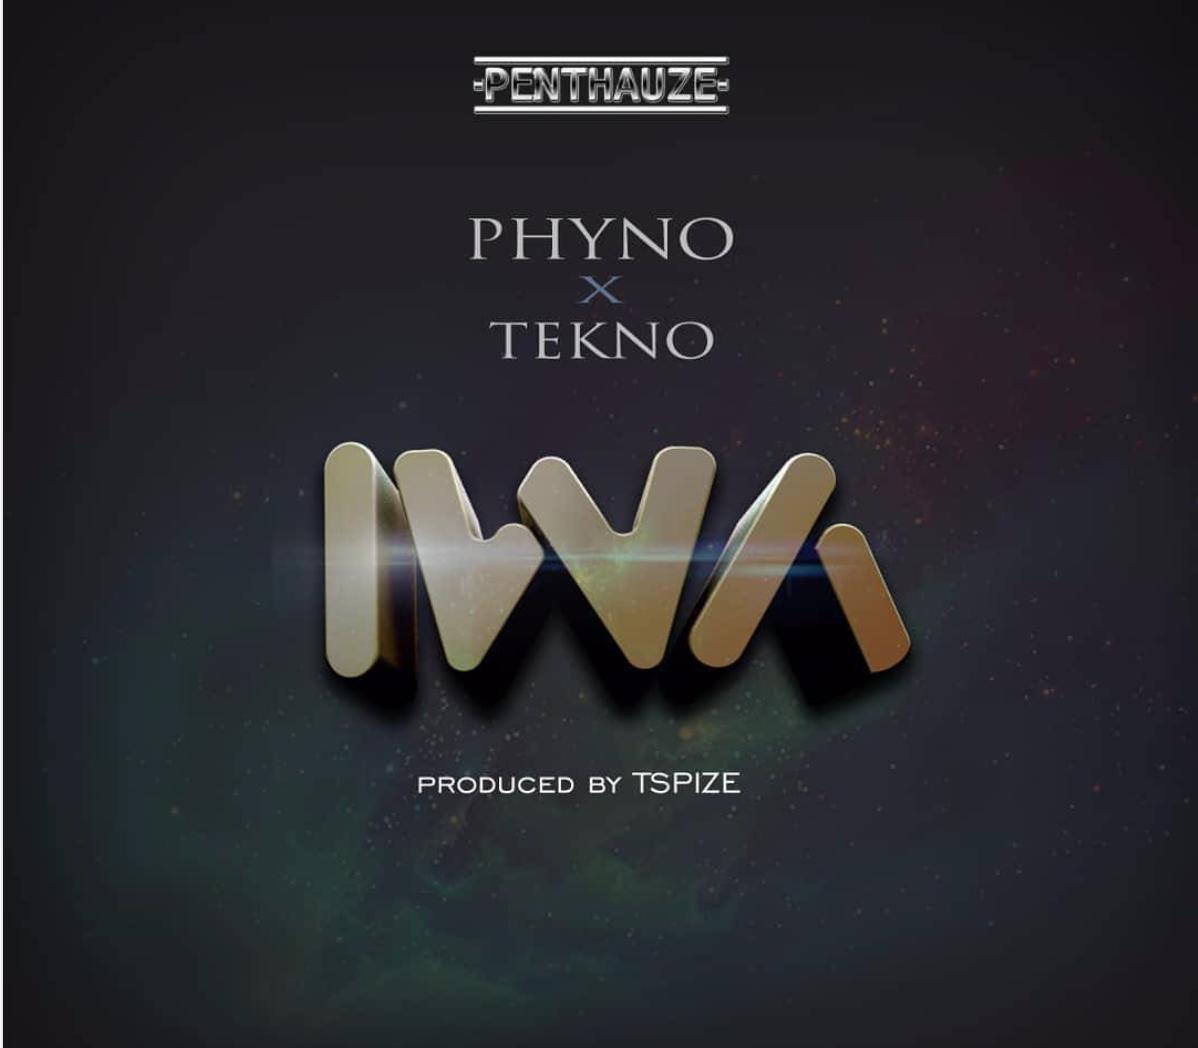 Phyno ft Tekno - Iwa - Notjustok